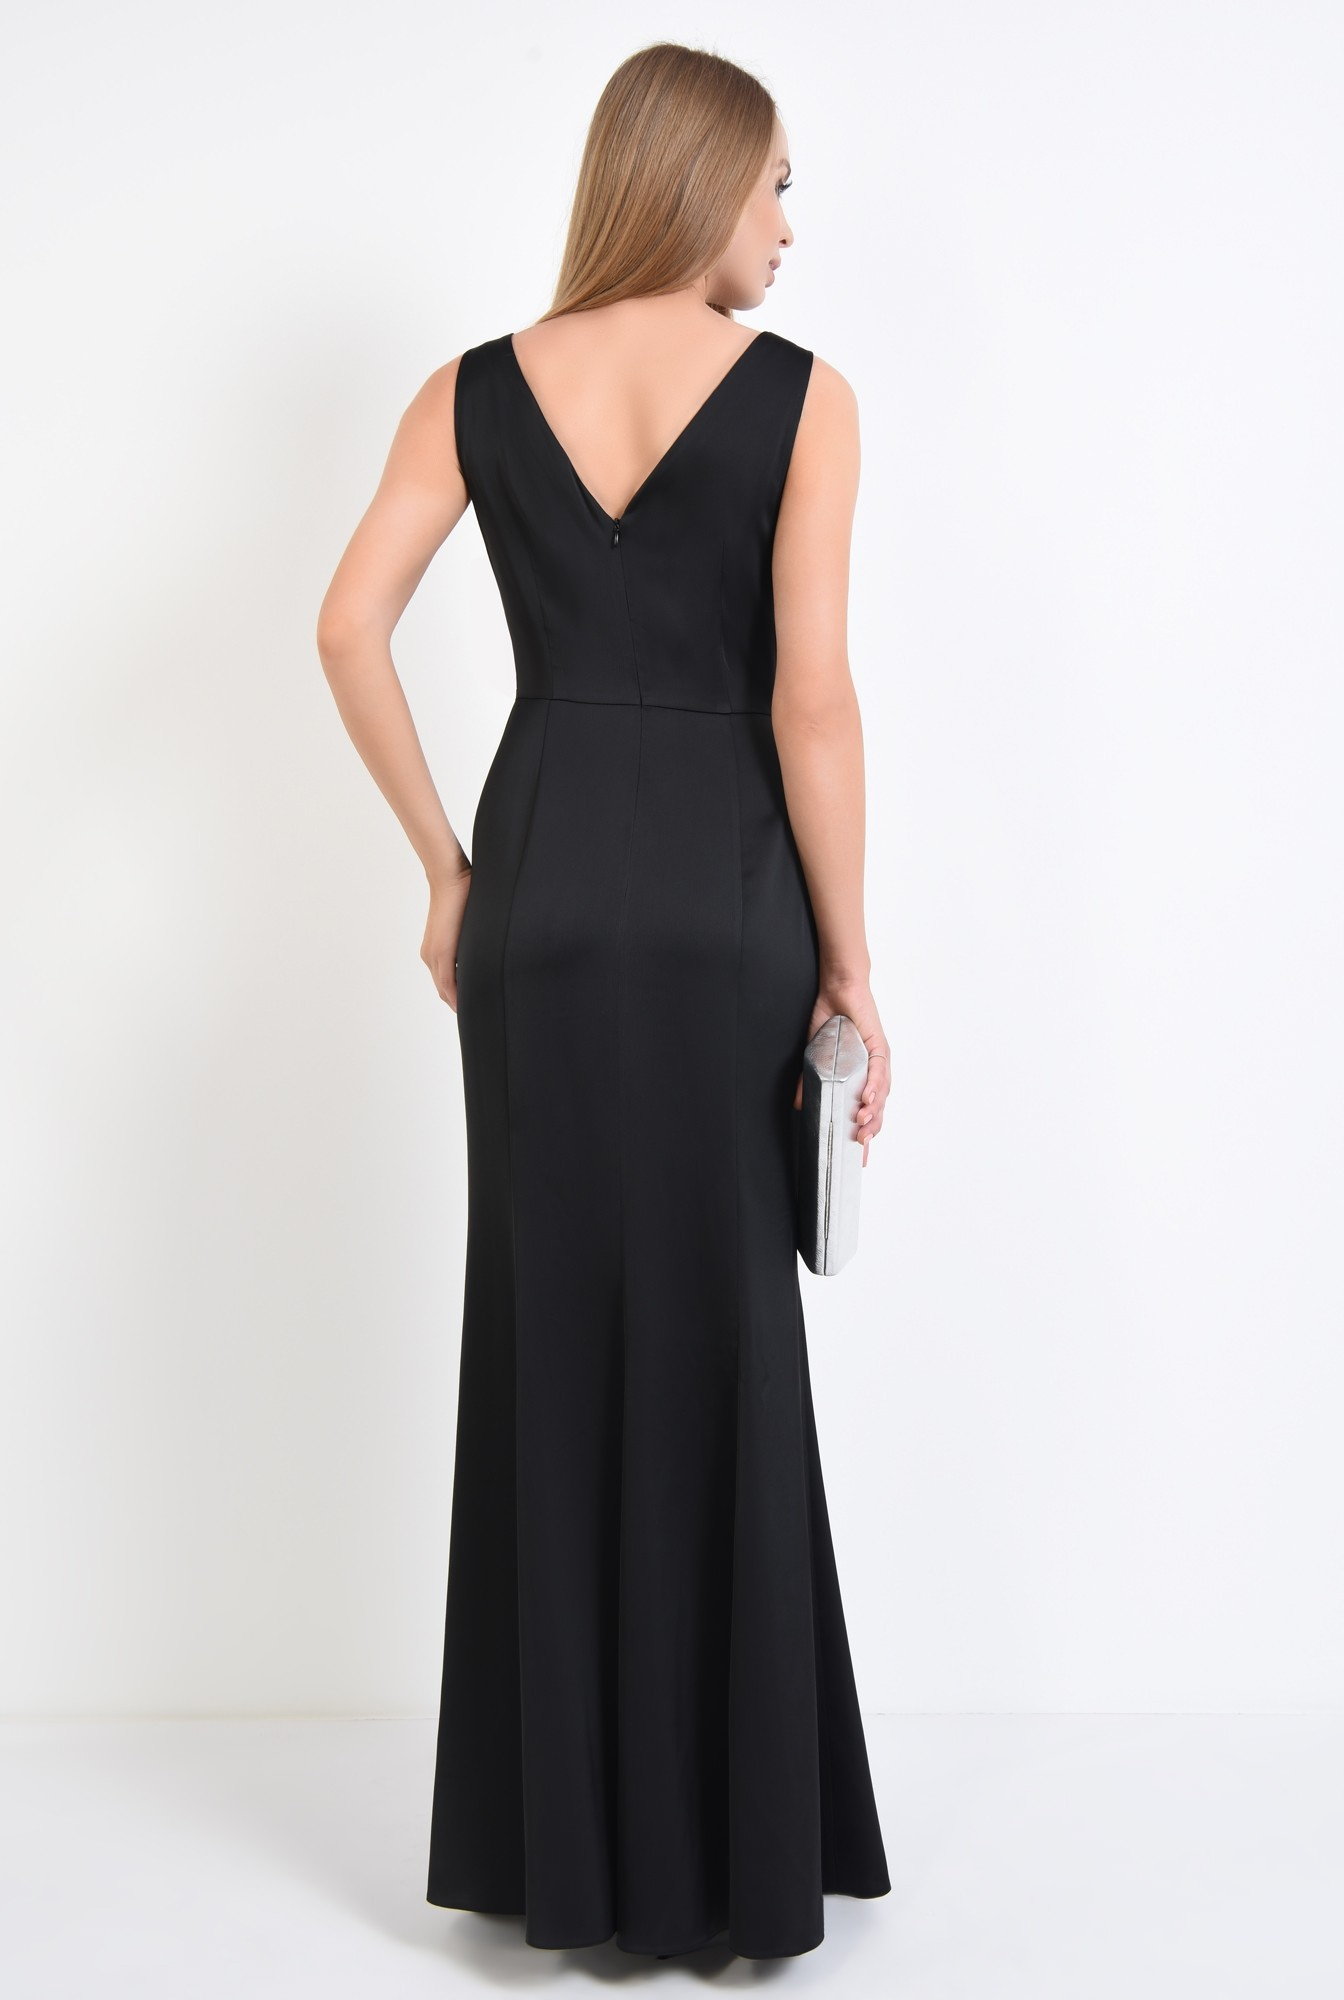 1 - rochie de seara, petrecuta, neagra, satin, cu funda, strasuri